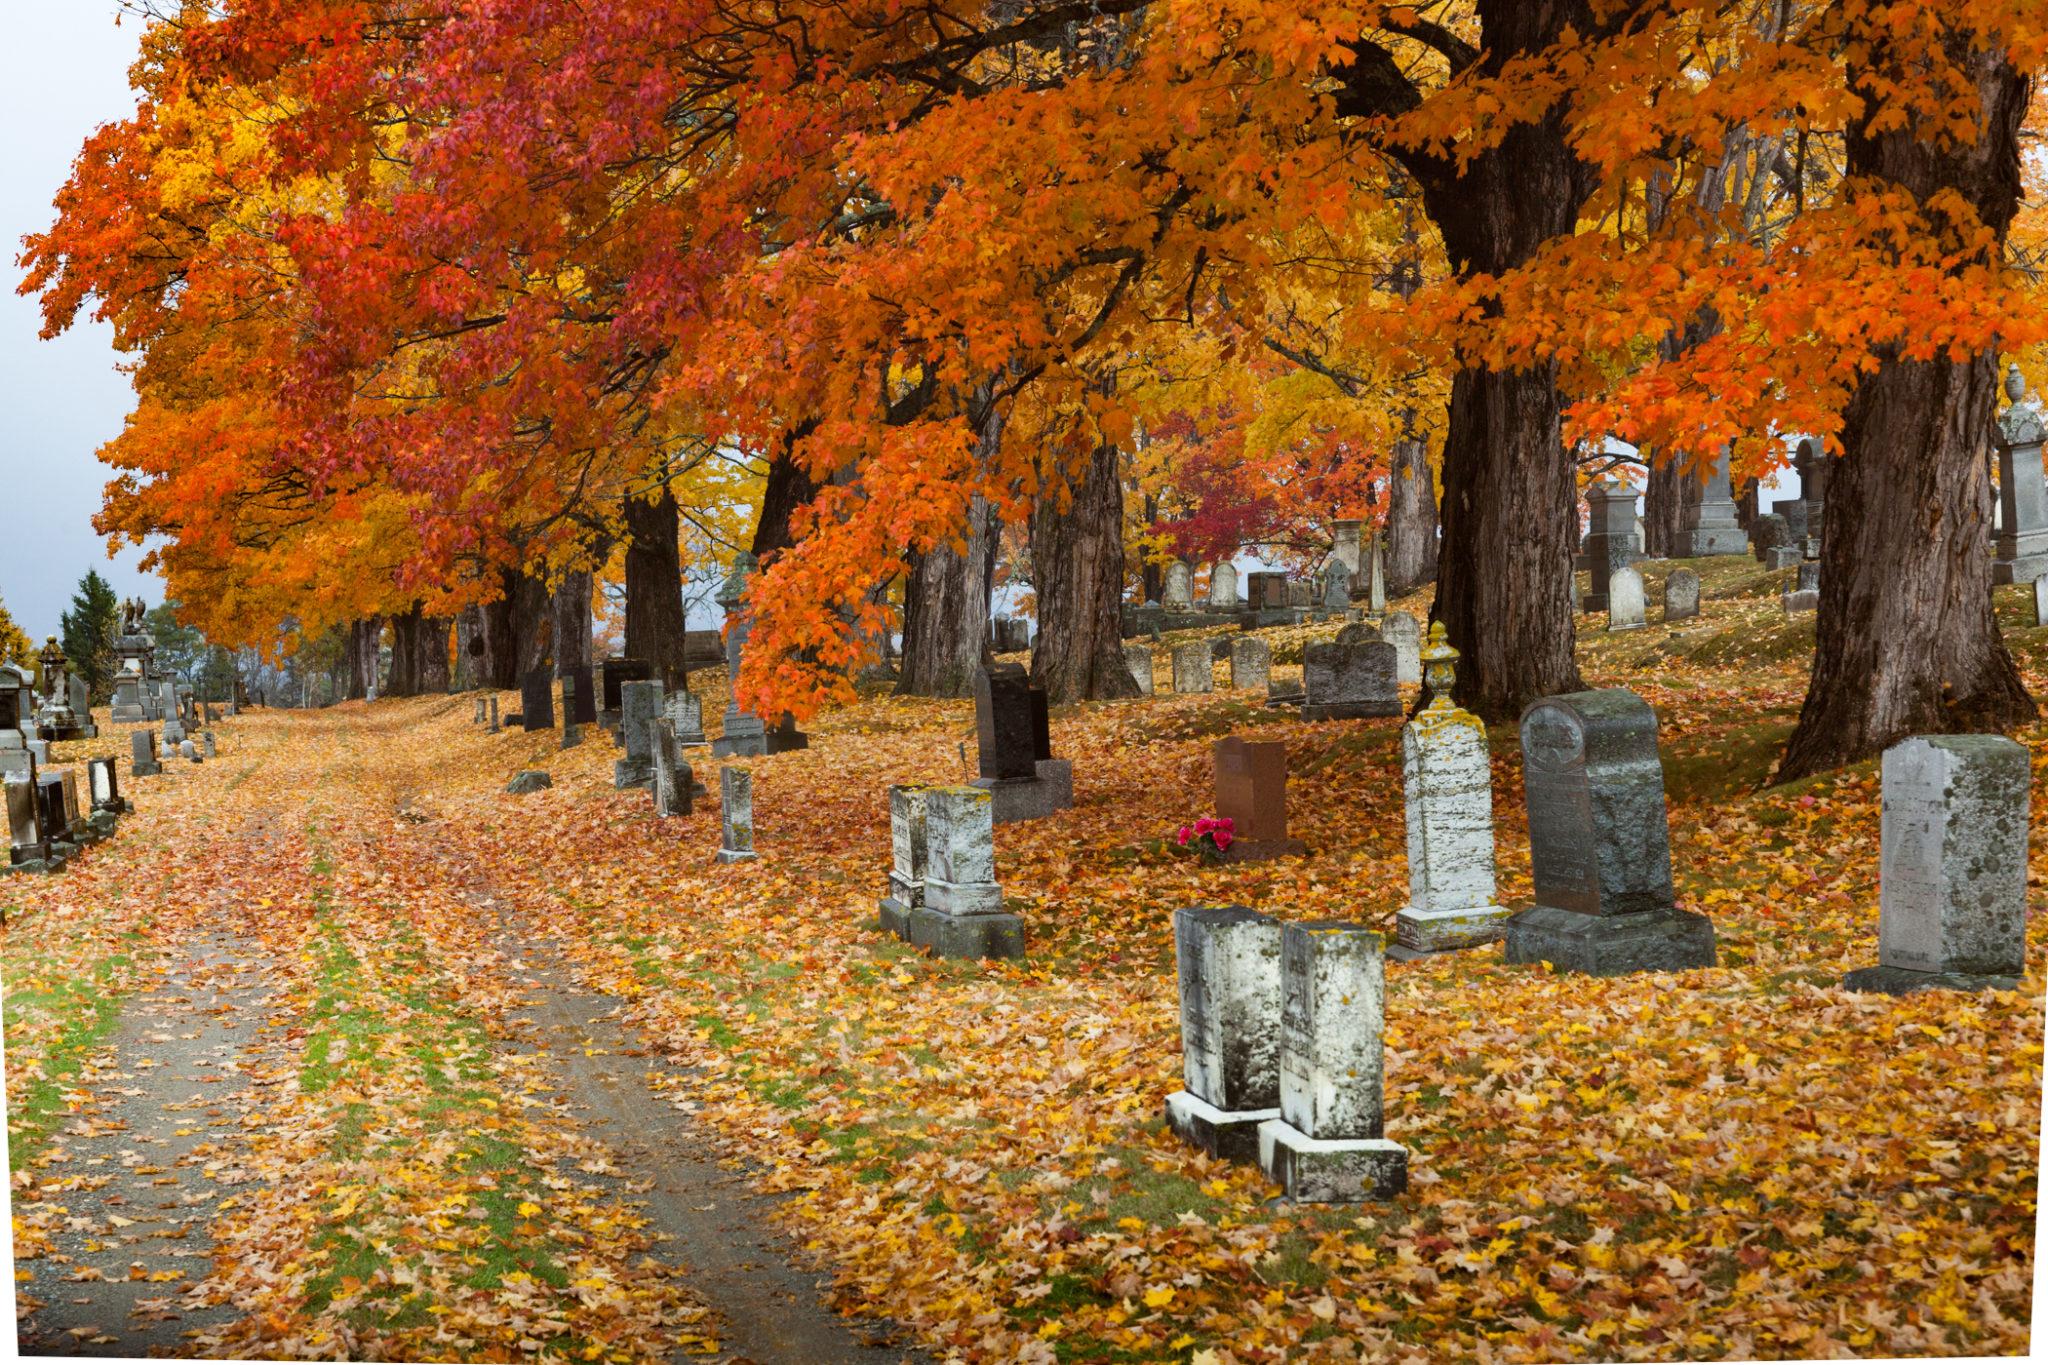 Seasons in Maine: Fall - Oct 7-13, 2018 - Maine Media Workshops + ...